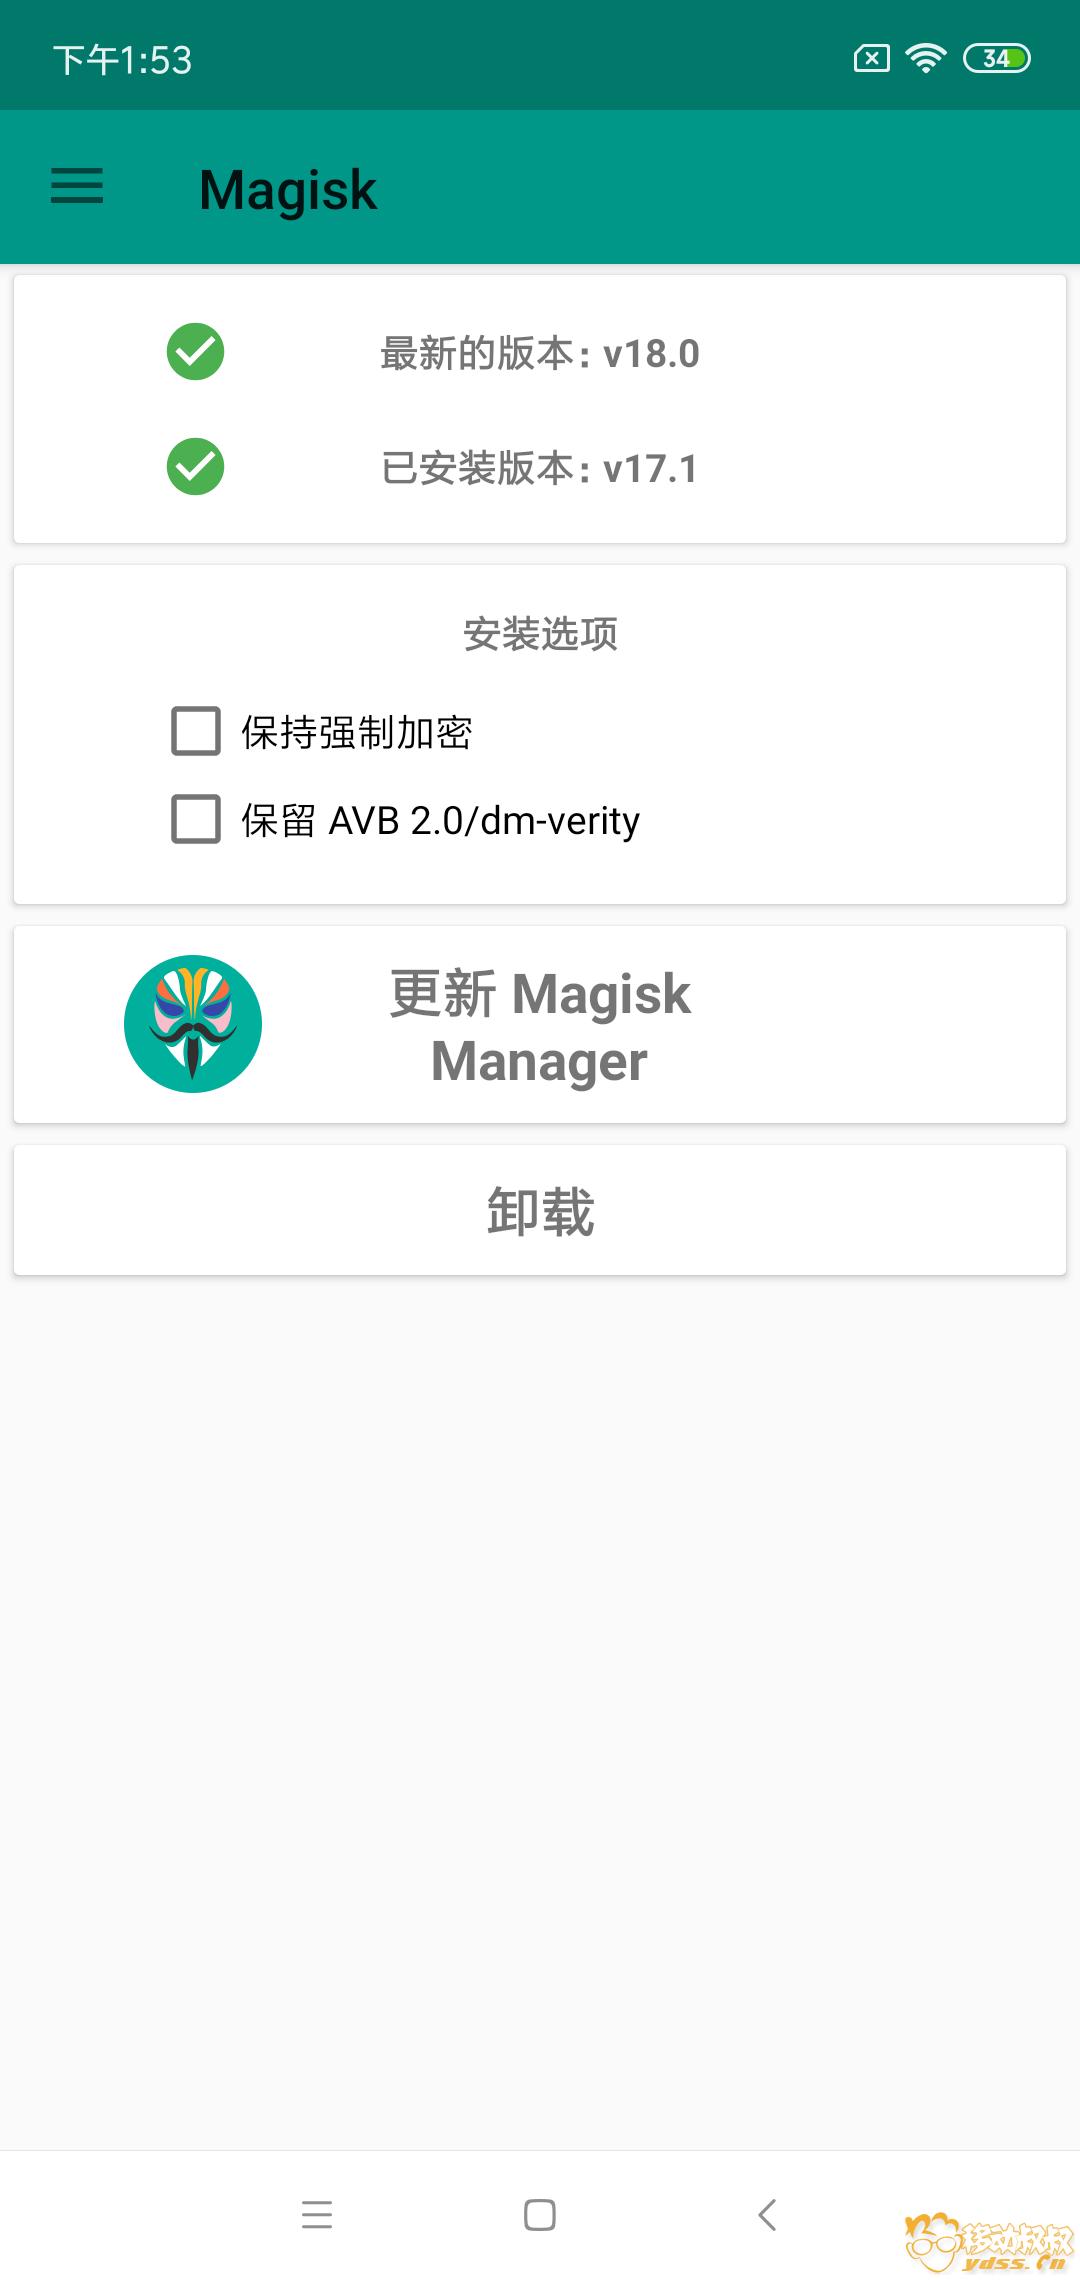 Screenshot_2019-01-01-13-53-22-315_com.topjohnwu.magisk.png